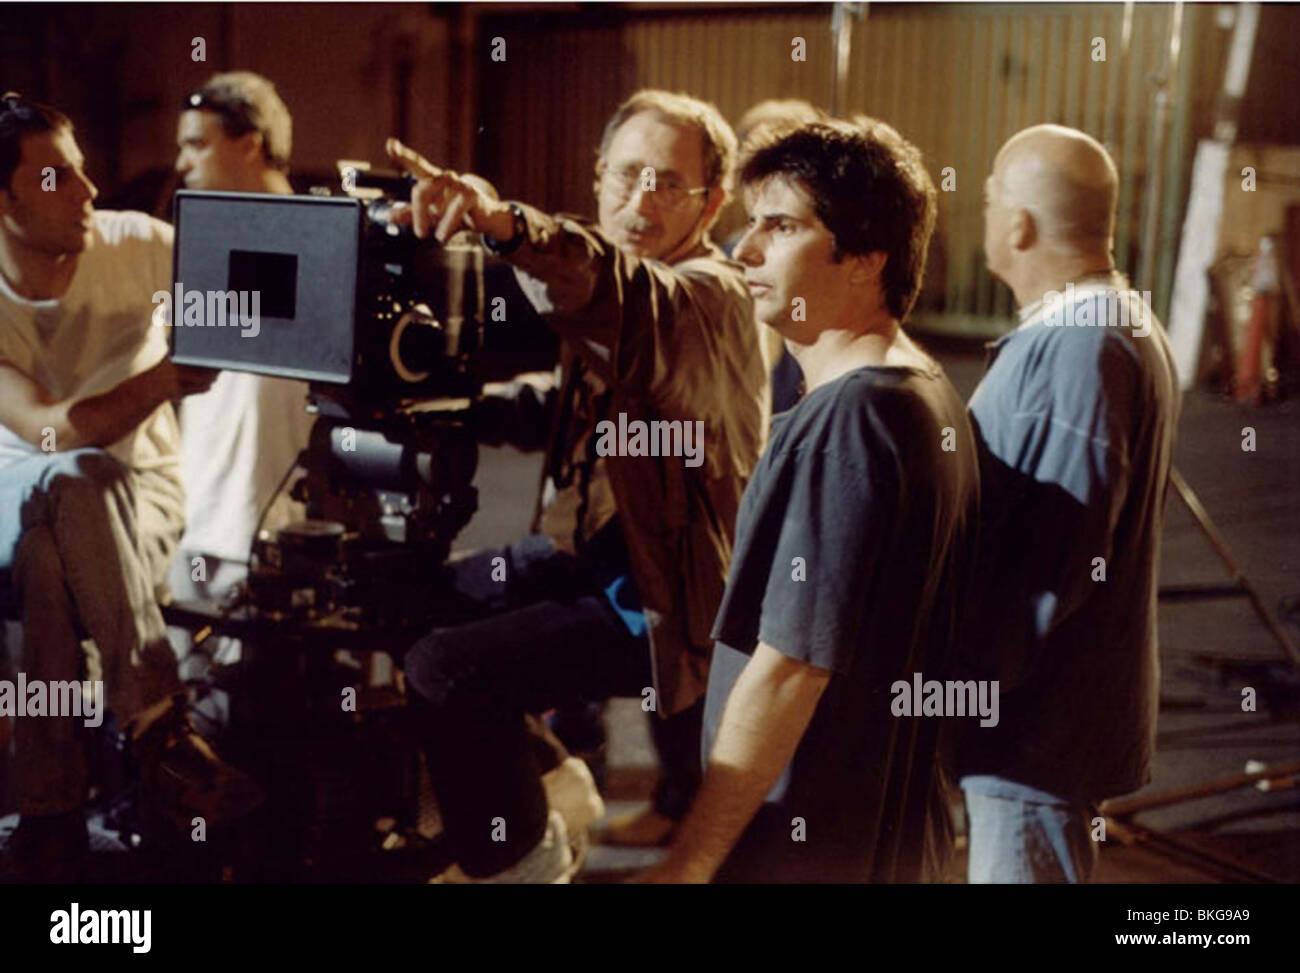 FILMING O/S 'BROKEN WINGS (KNAFAYIM SHVOROT)' (2002) WITH NIR BERGMAN (DIR), VALENTIN BELONOGOV (DIR PHOTO) - Stock Image